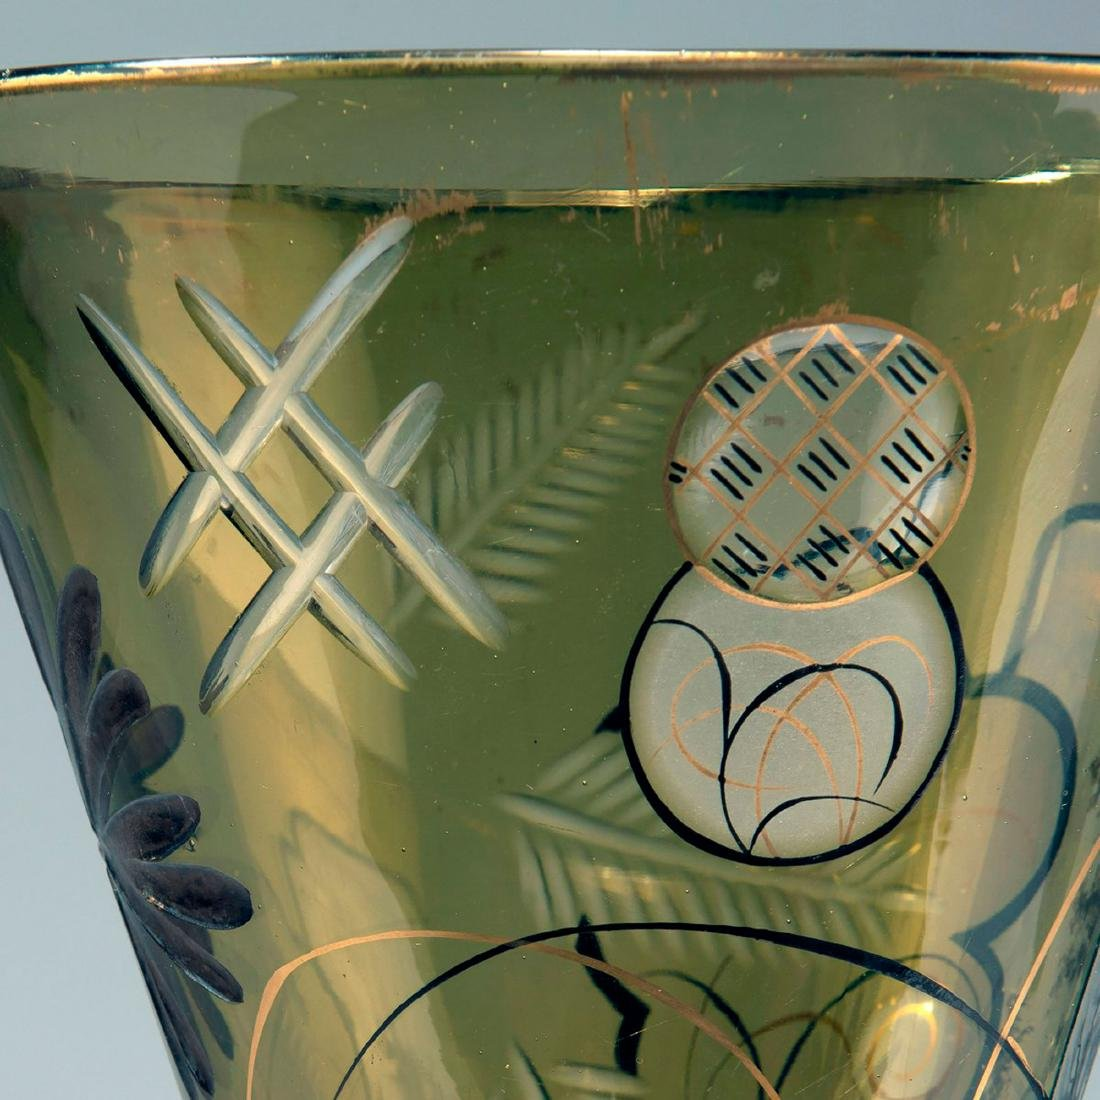 Historicising vase, 1887 - 4